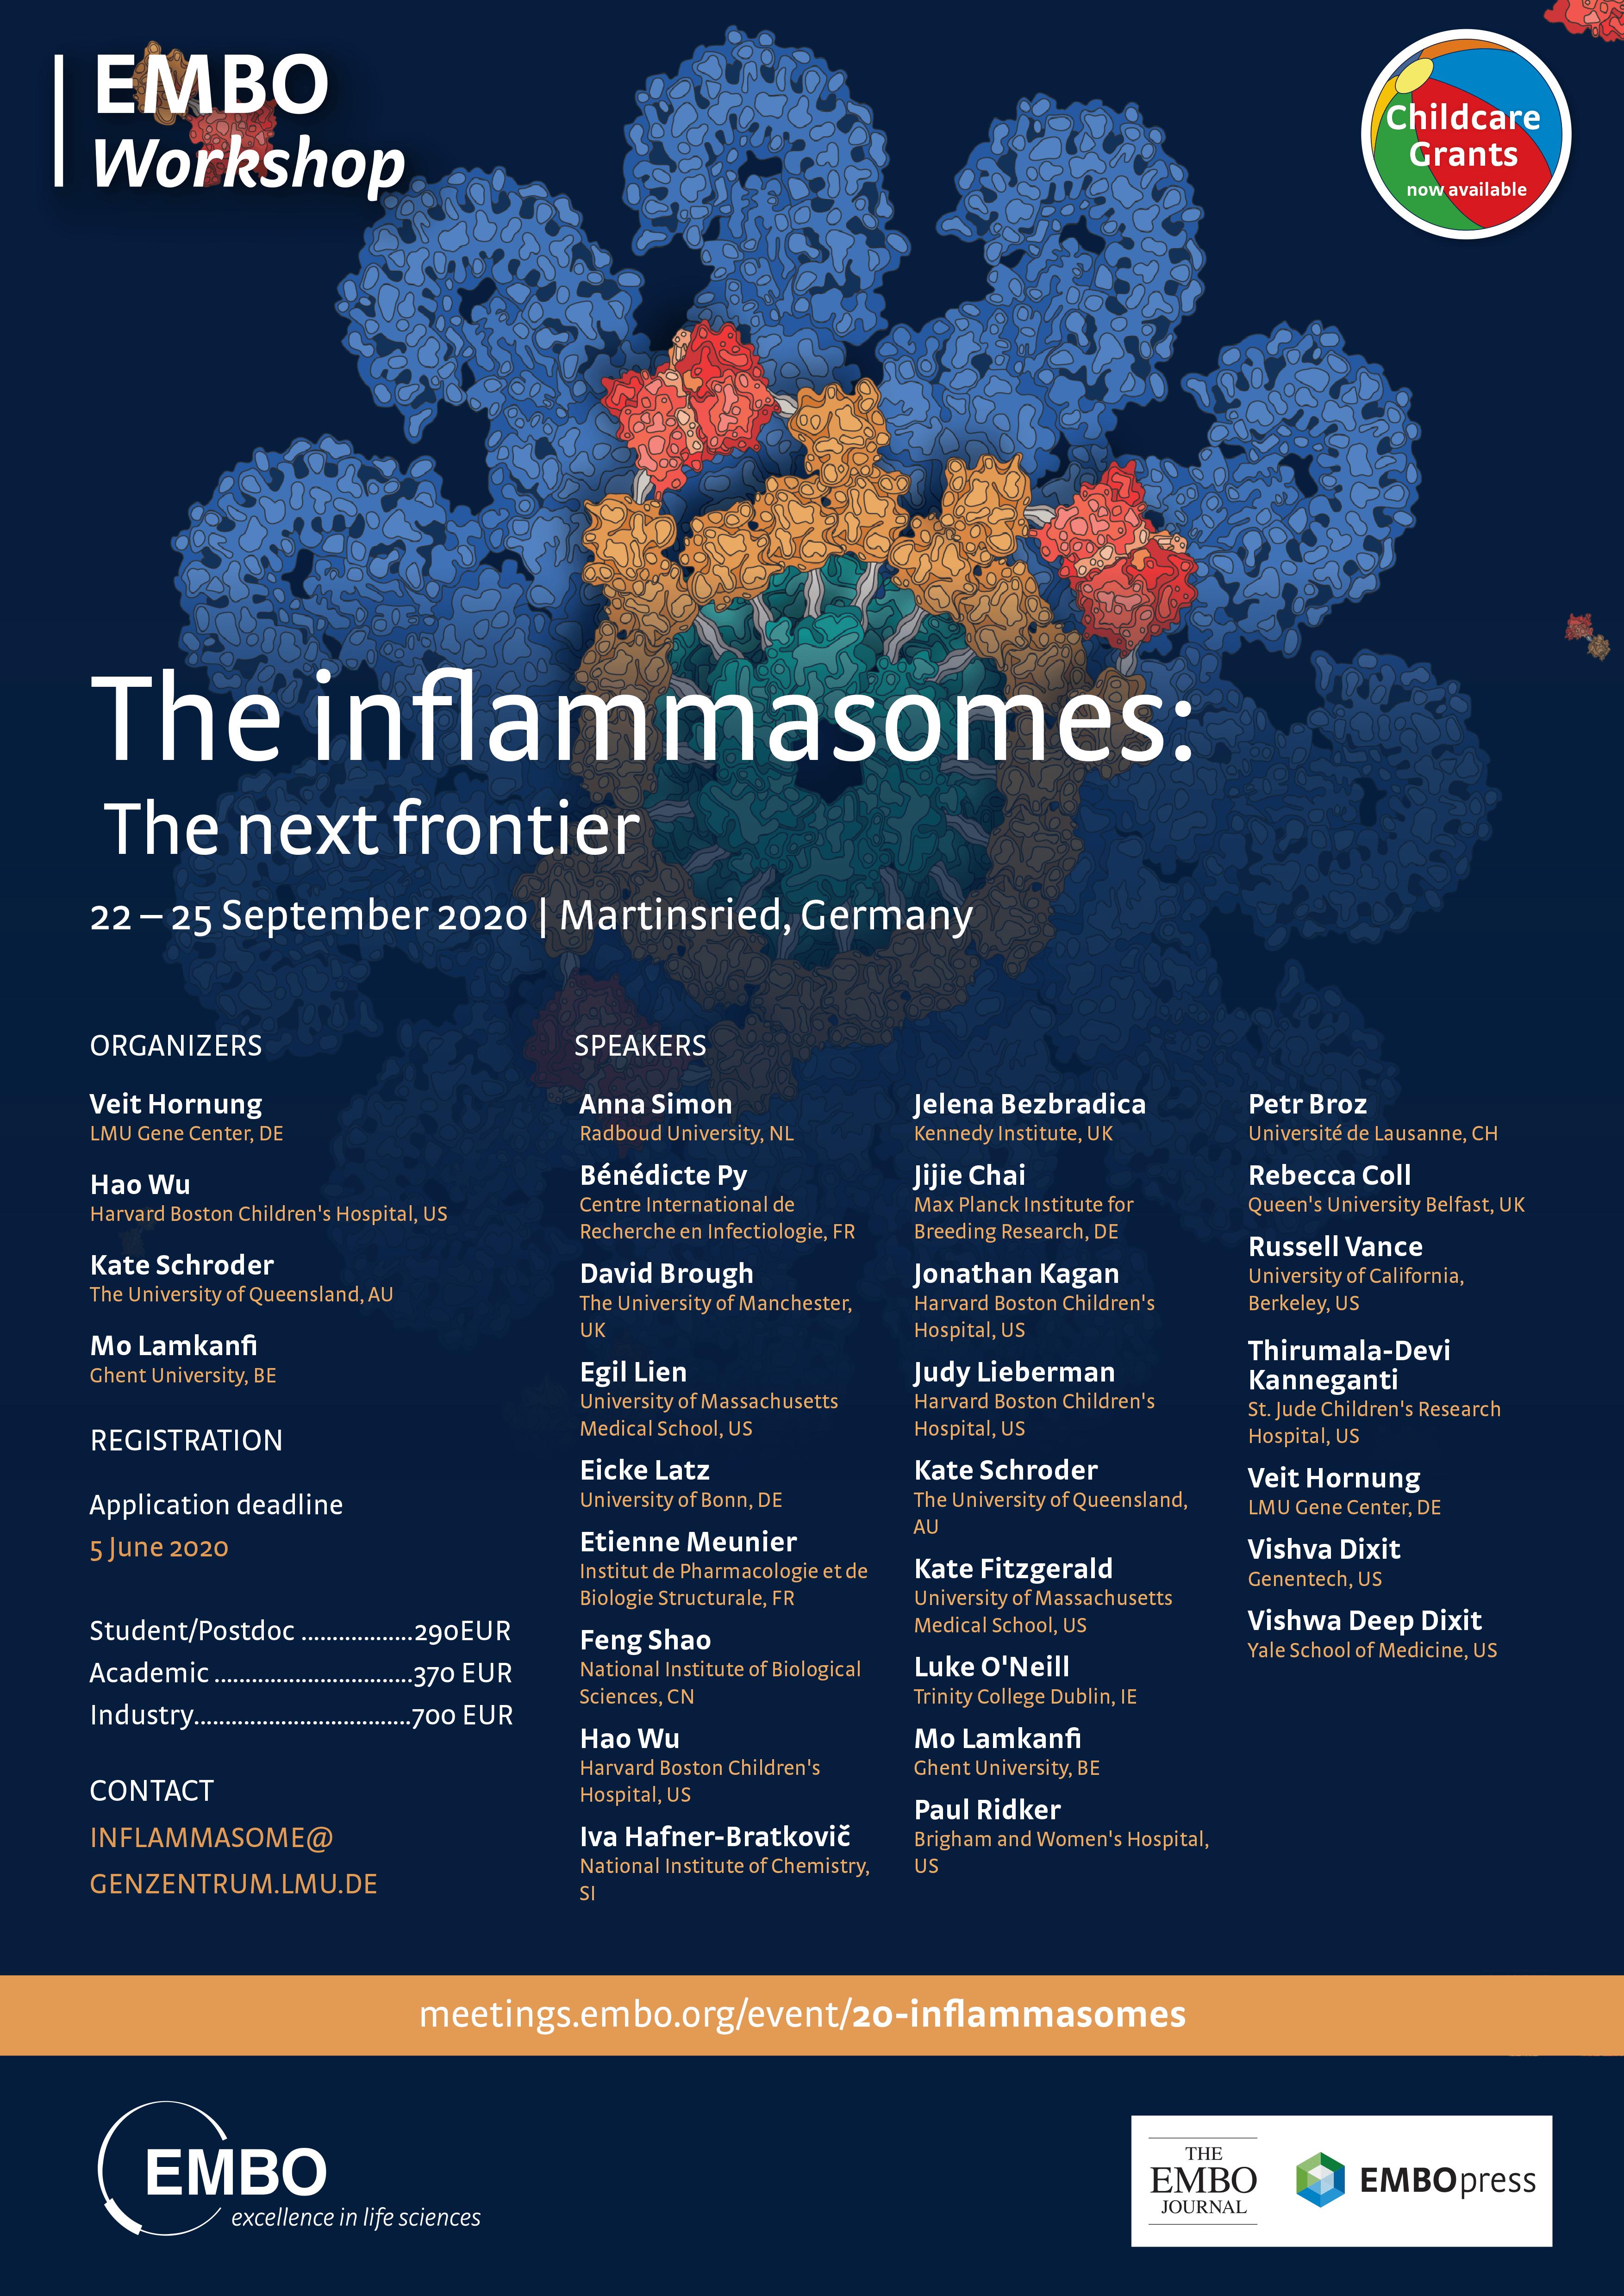 EMBO Inflammasomes 2020